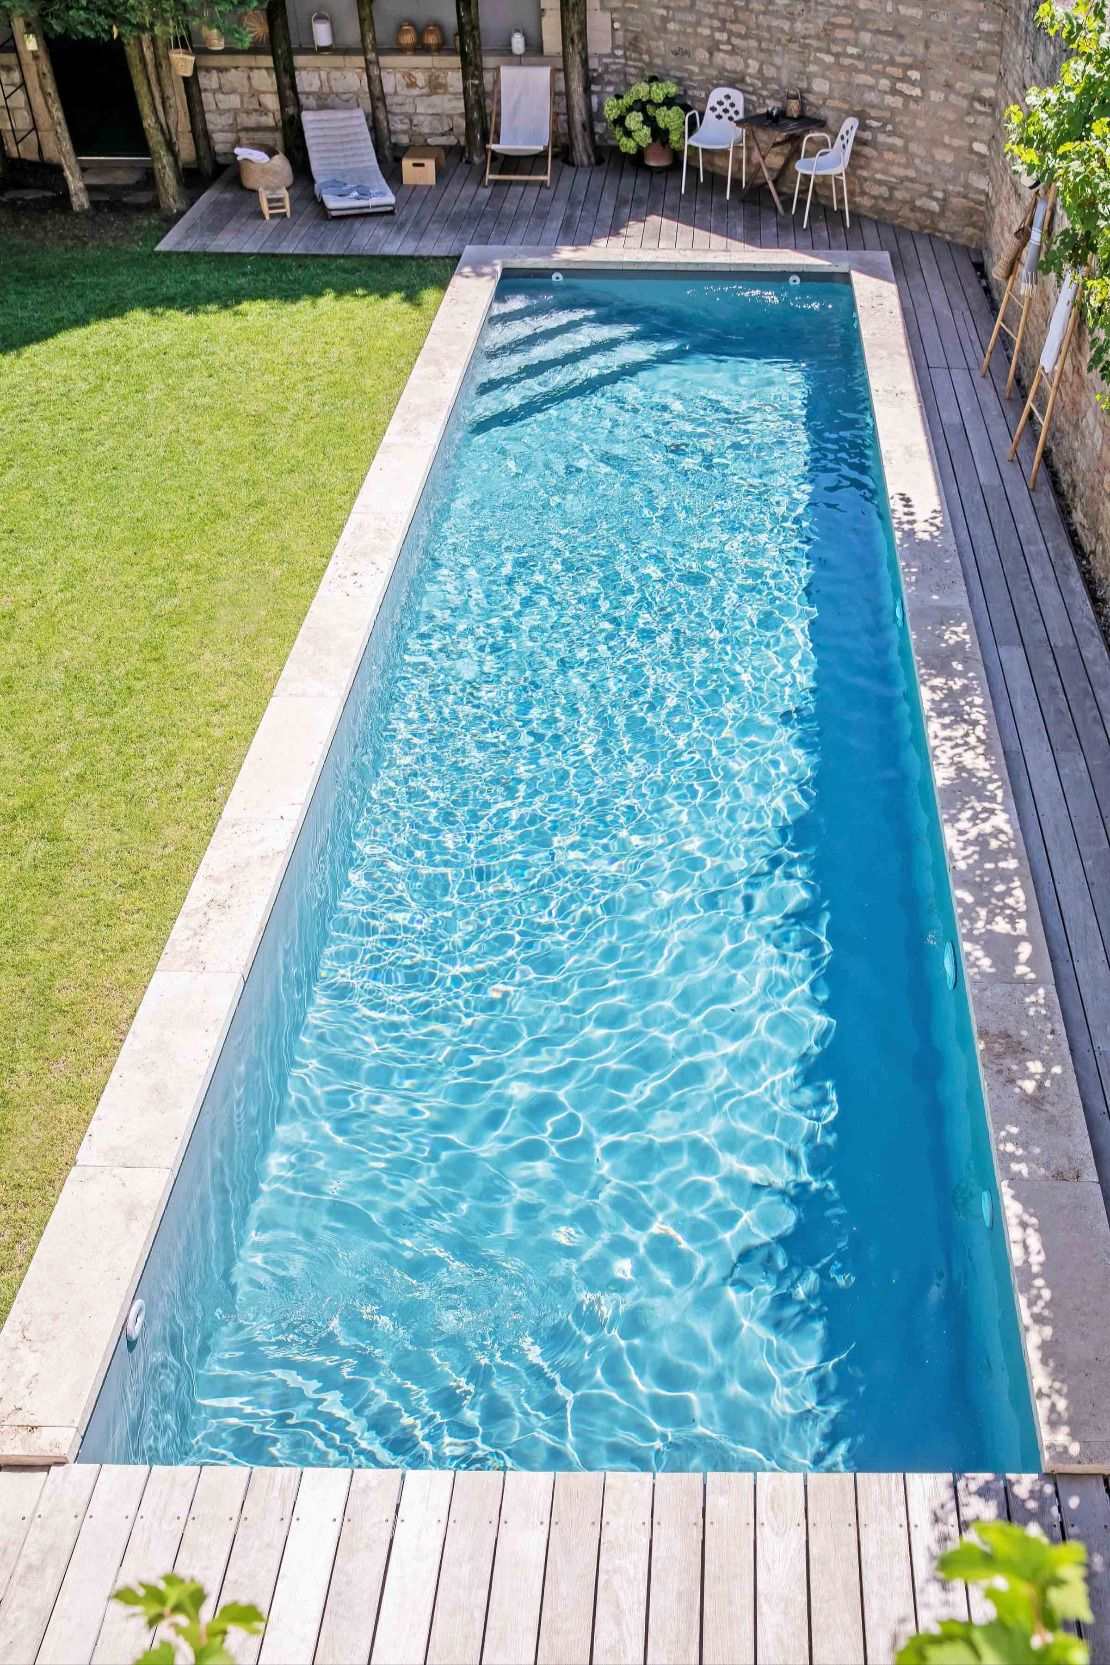 Mediterrane Garten Und Poollandschaft In 2020 Gartenpools Garten Pool Im Garten